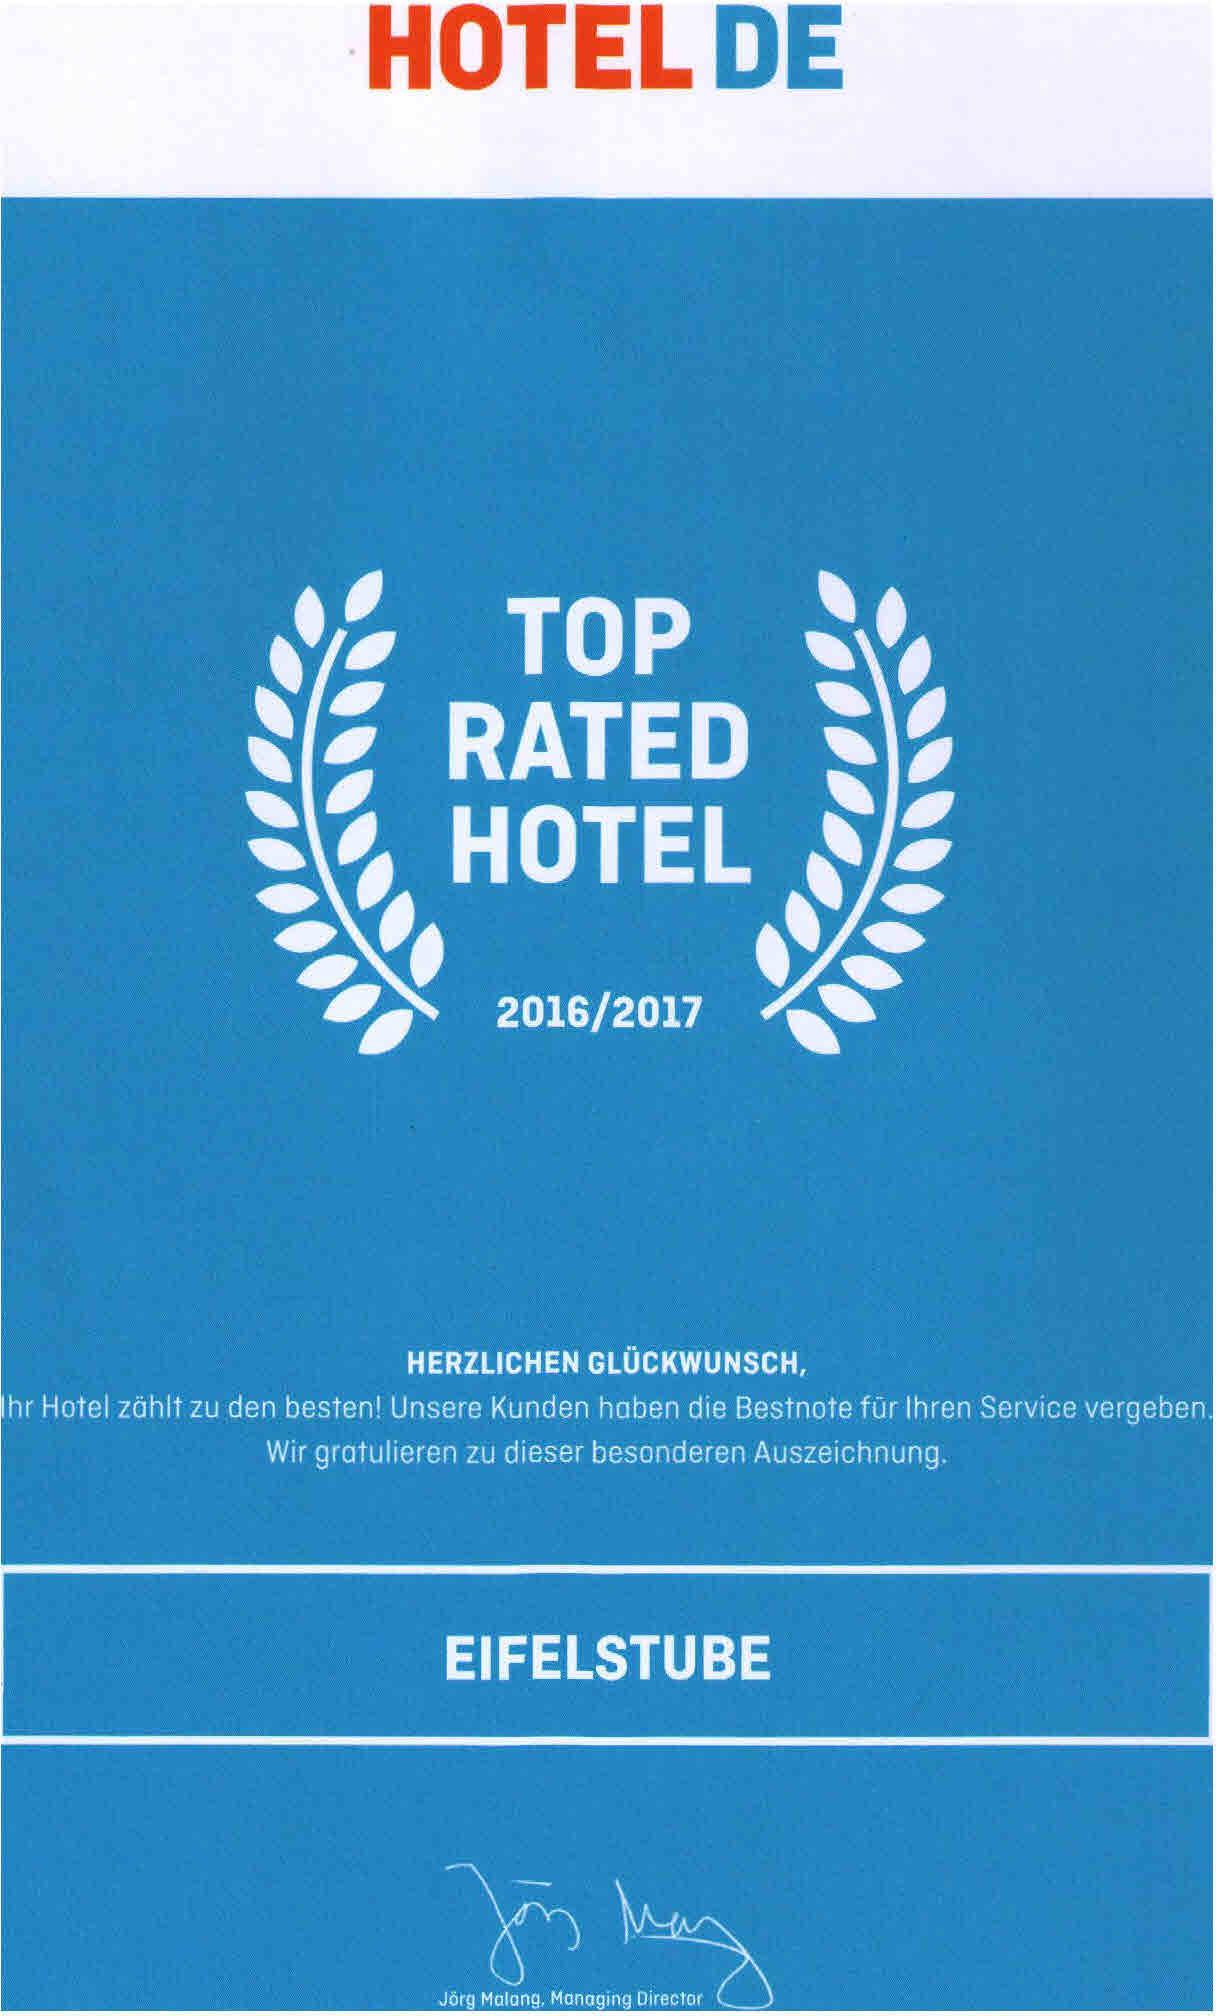 Eifelstube Nürburgring Hotel.de HRS Bewertungen Reviews Auszeichnungen Awards  Restaurant